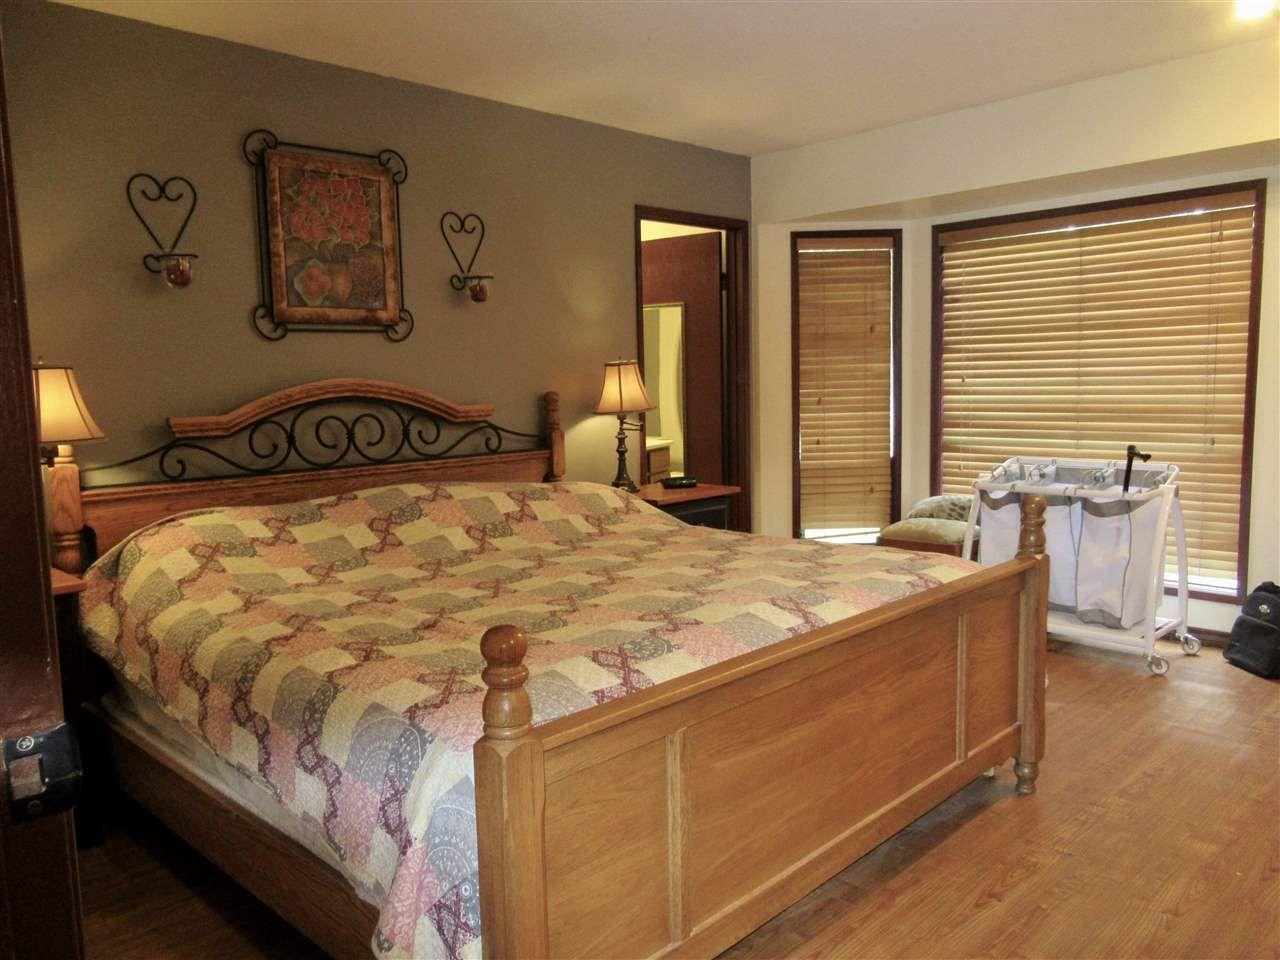 Photo 9: Photos: 911 CENTAUR Drive in Williams Lake: Esler/Dog Creek House for sale (Williams Lake (Zone 27))  : MLS®# R2378444